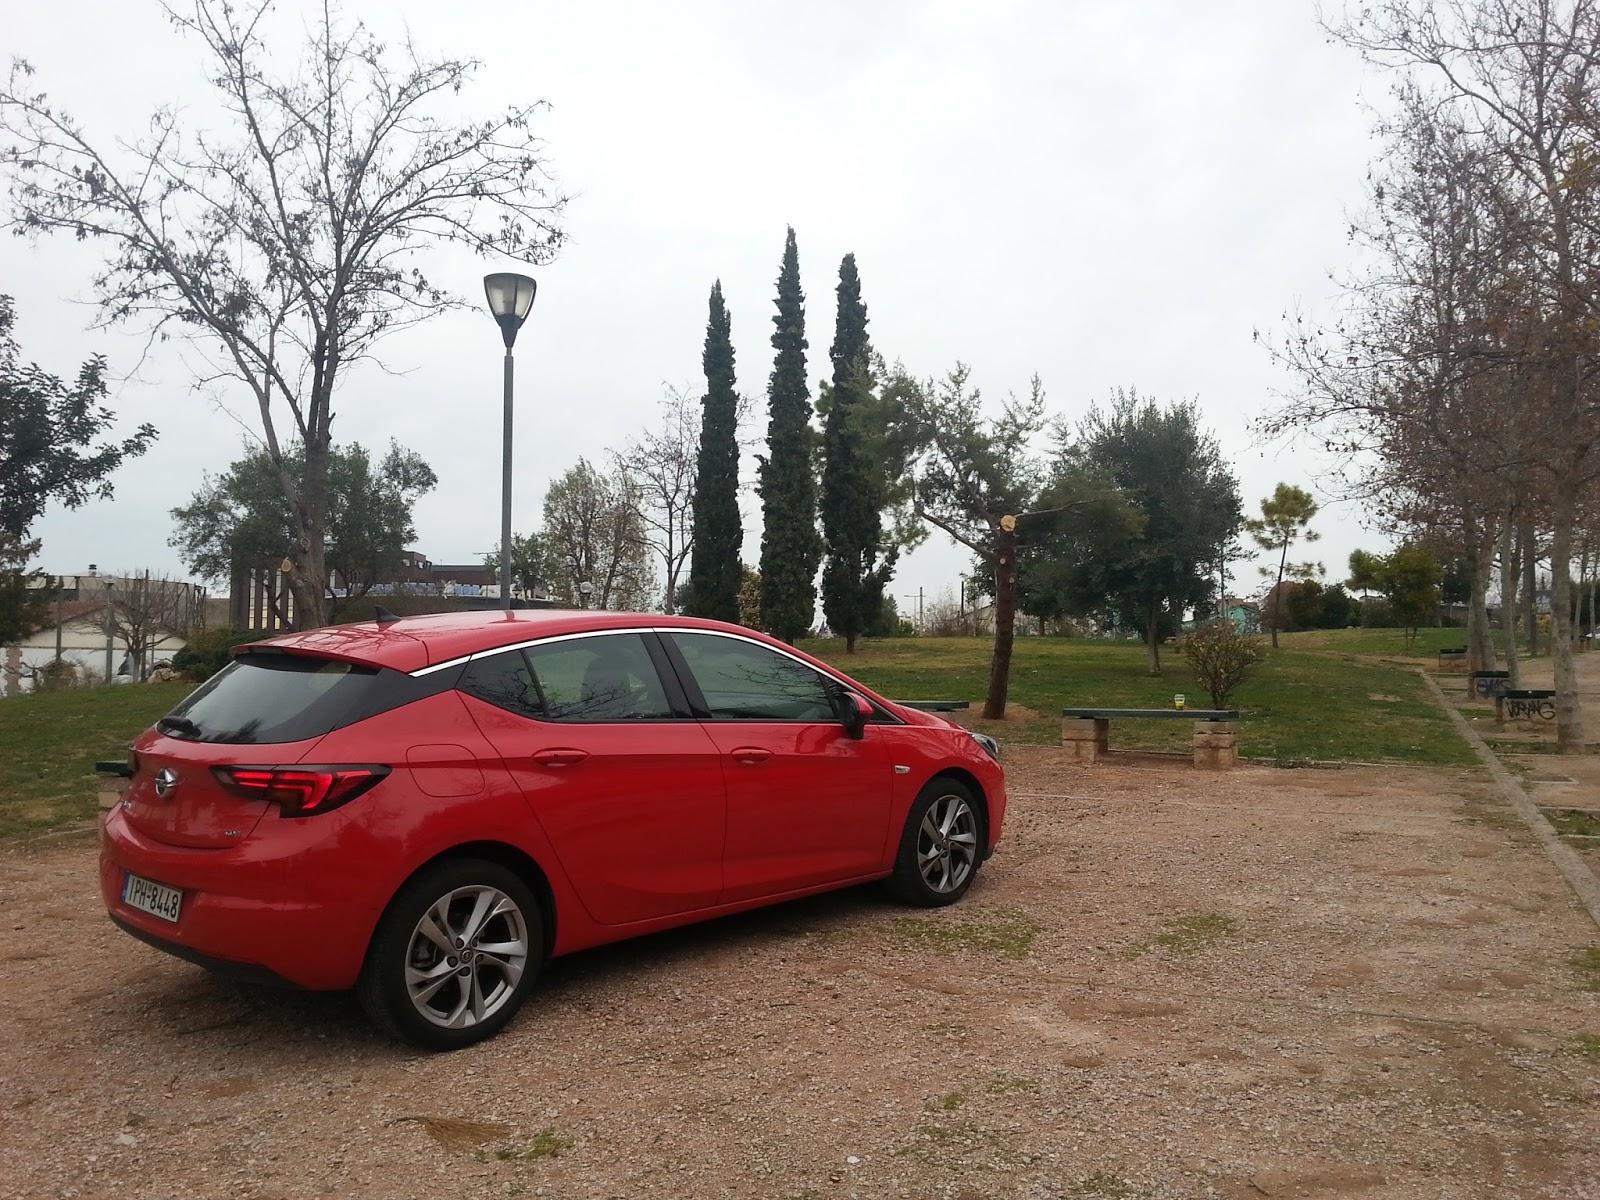 astratspisoplai Πόσο αστέρι είναι, τελικά, το νέο Astra; Diesel, Opel, Opel Astra, TEST, zblog, ΔΟΚΙΜΕΣ, οδηγούμε